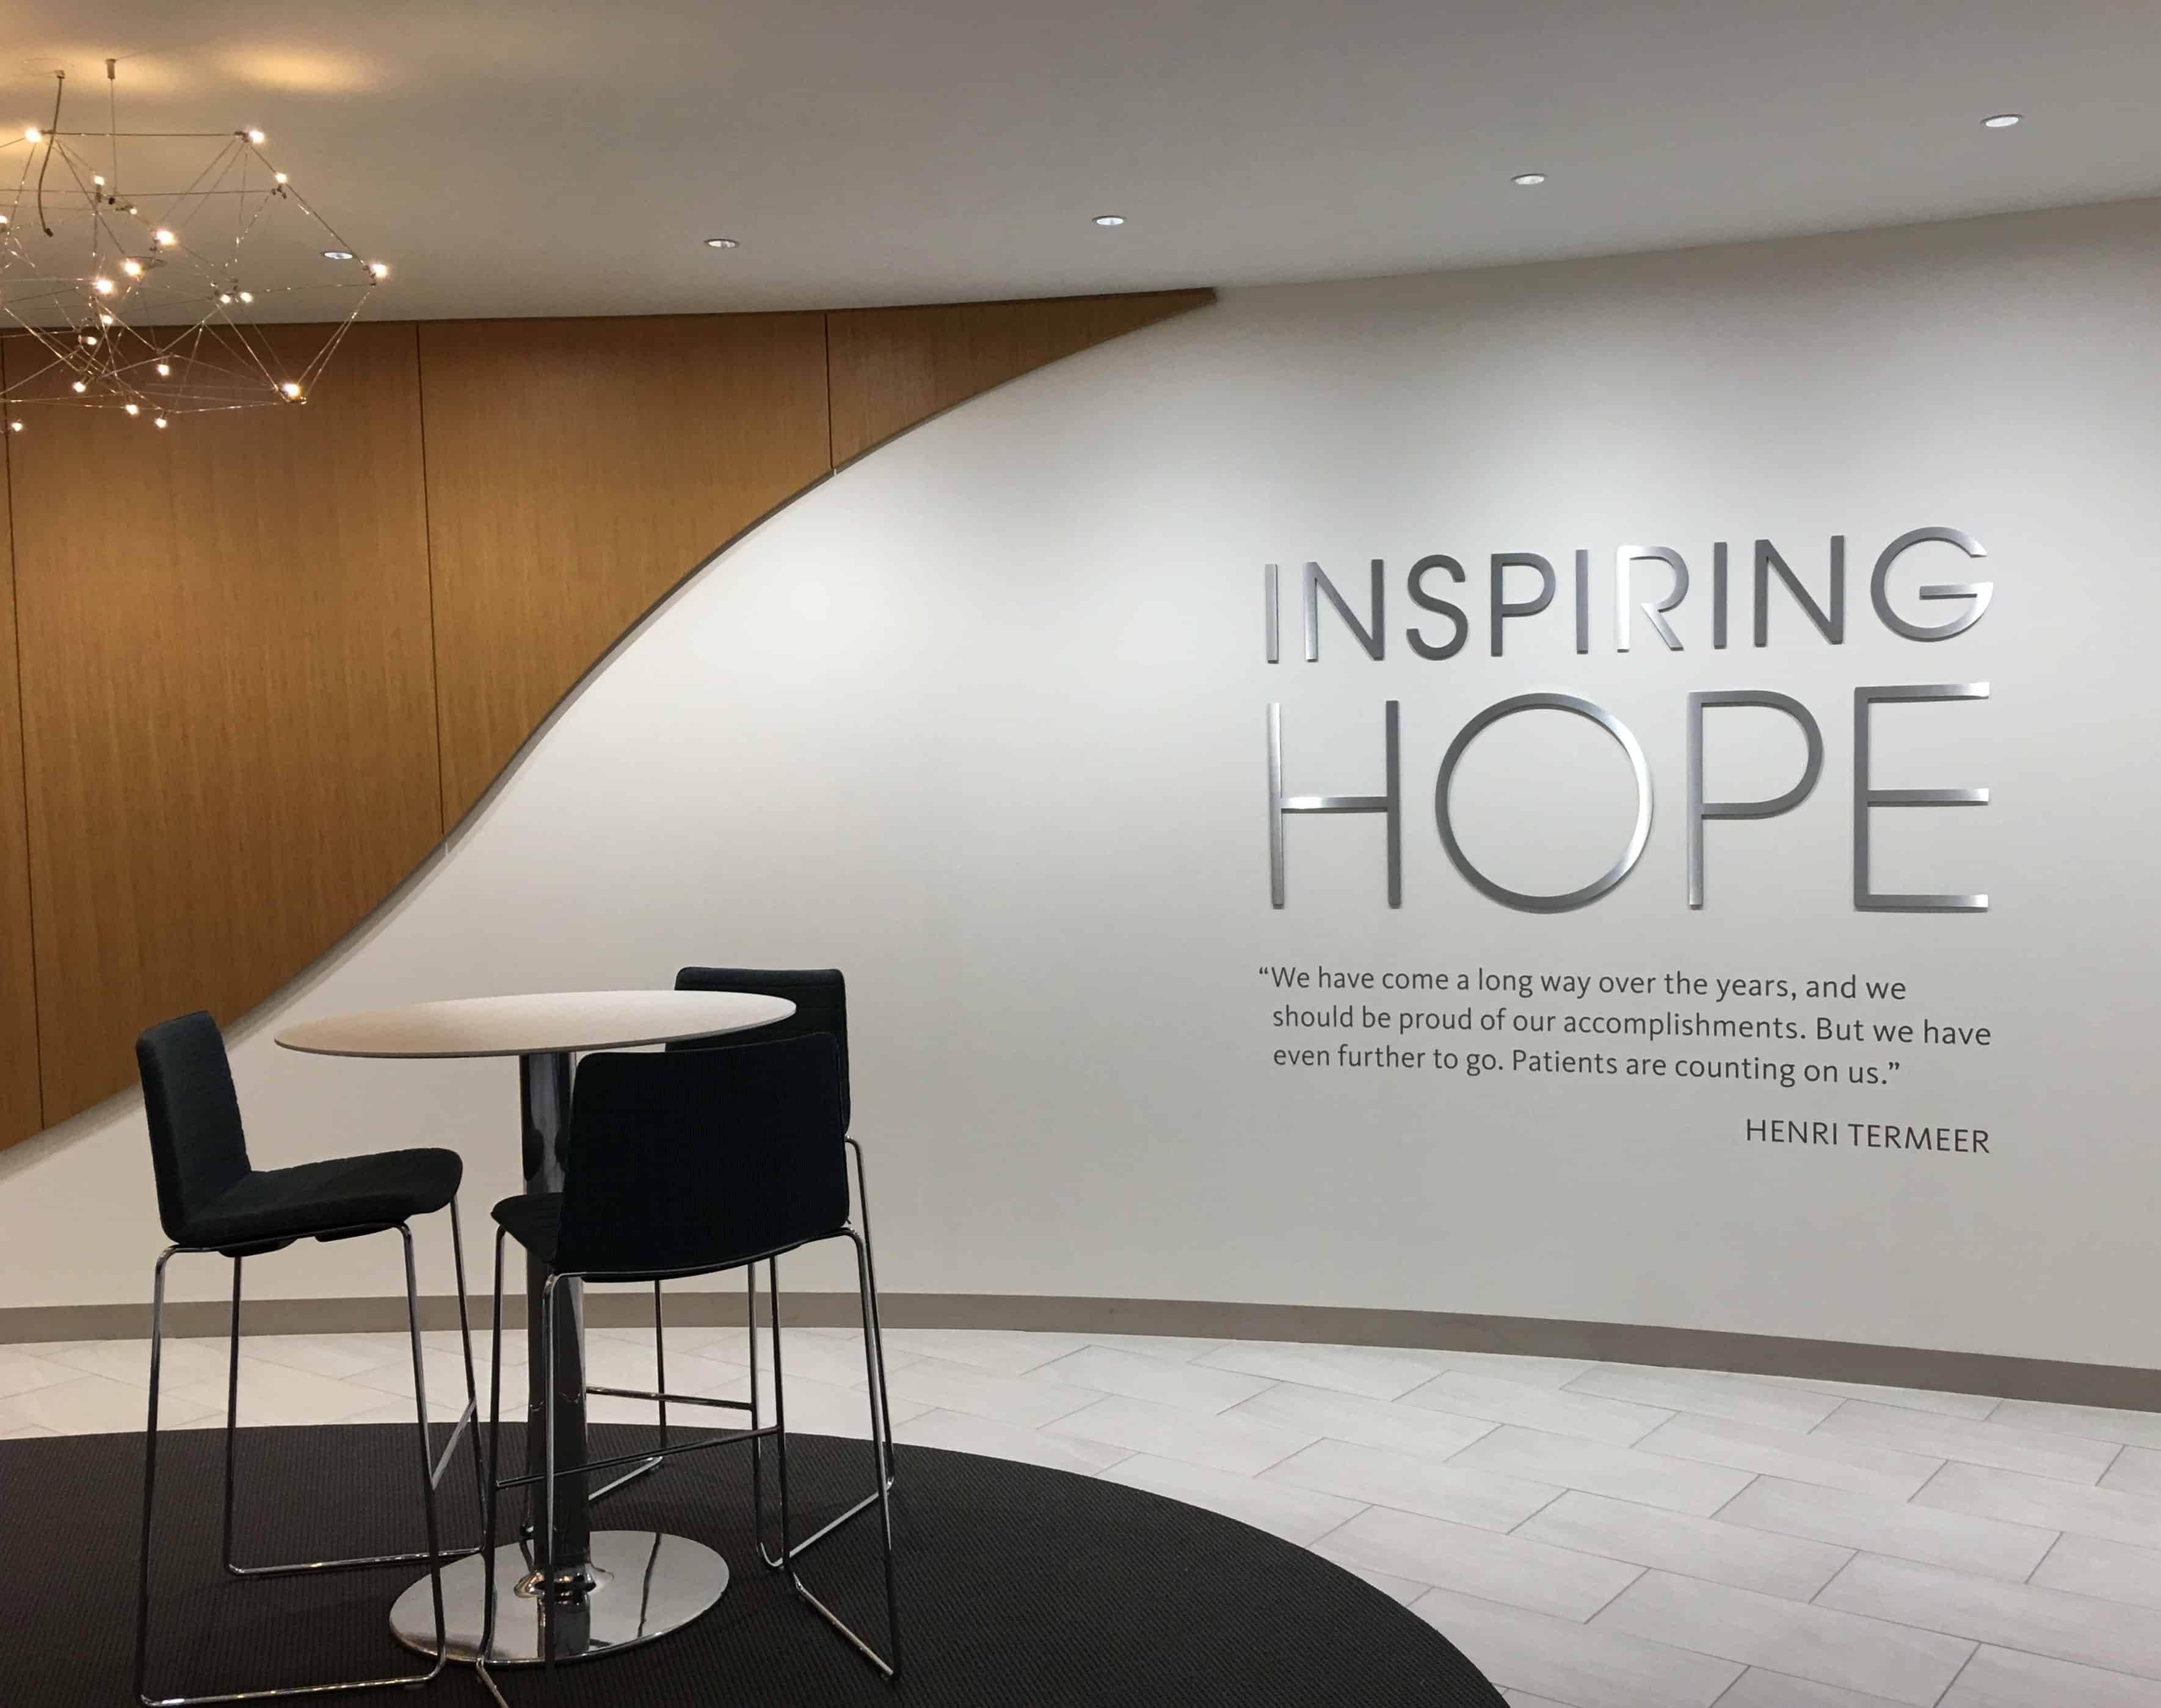 Sanofi Inspiring Hope Wall sign